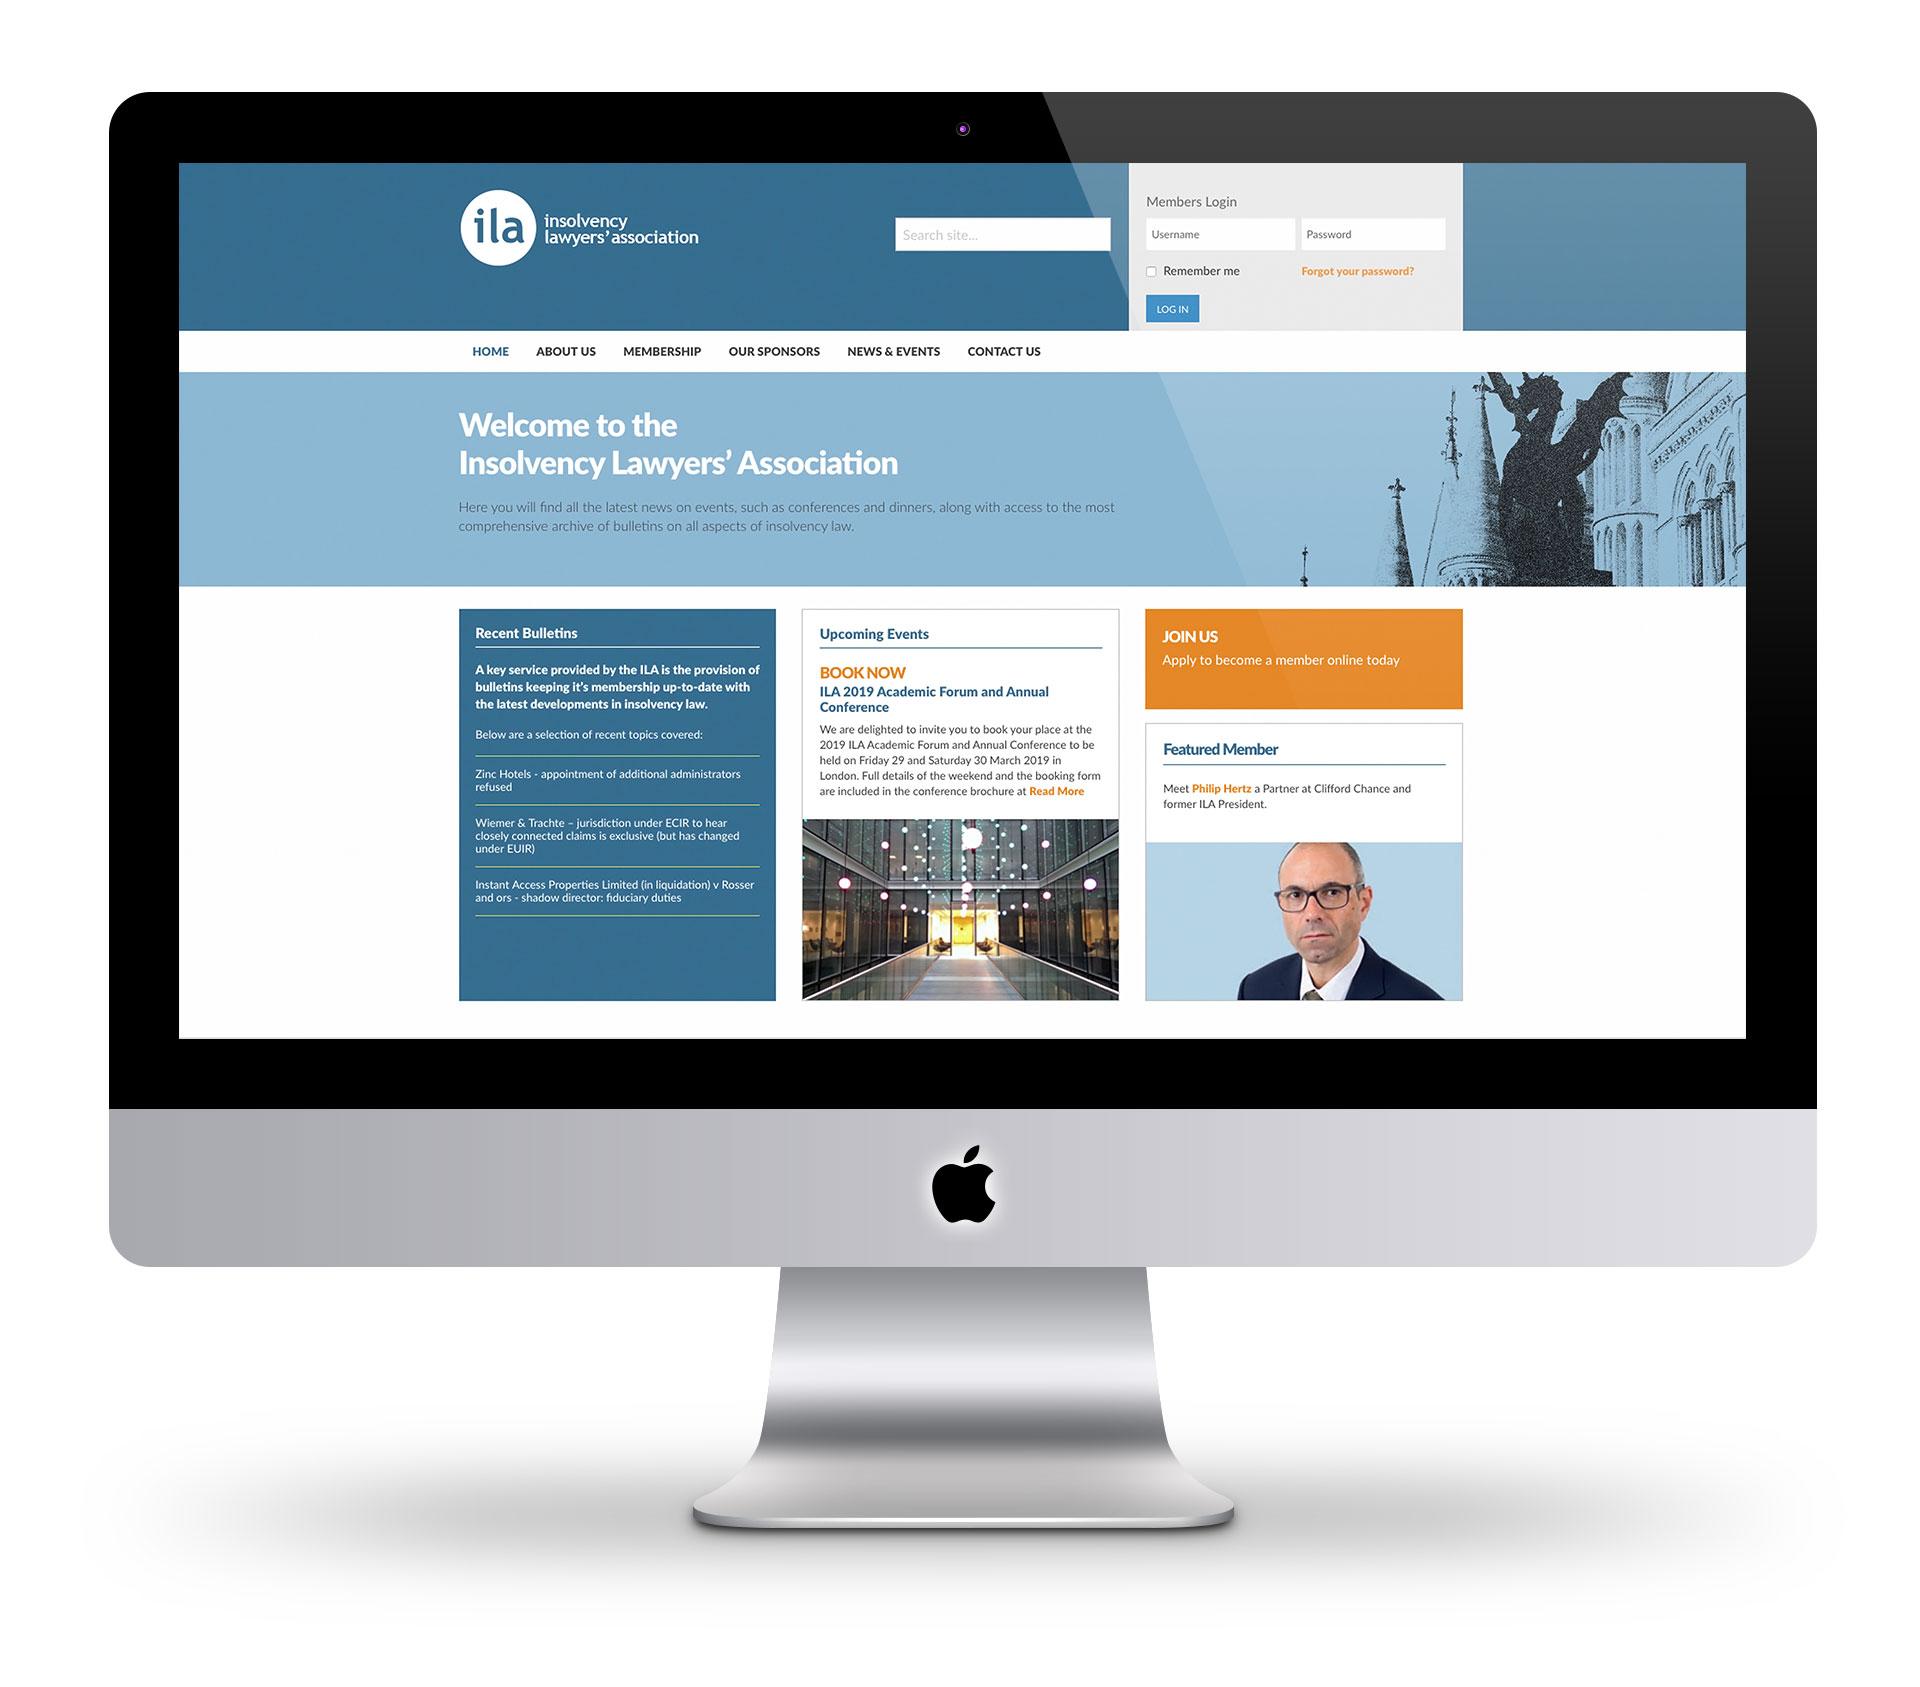 Insolvency Lawyers Association